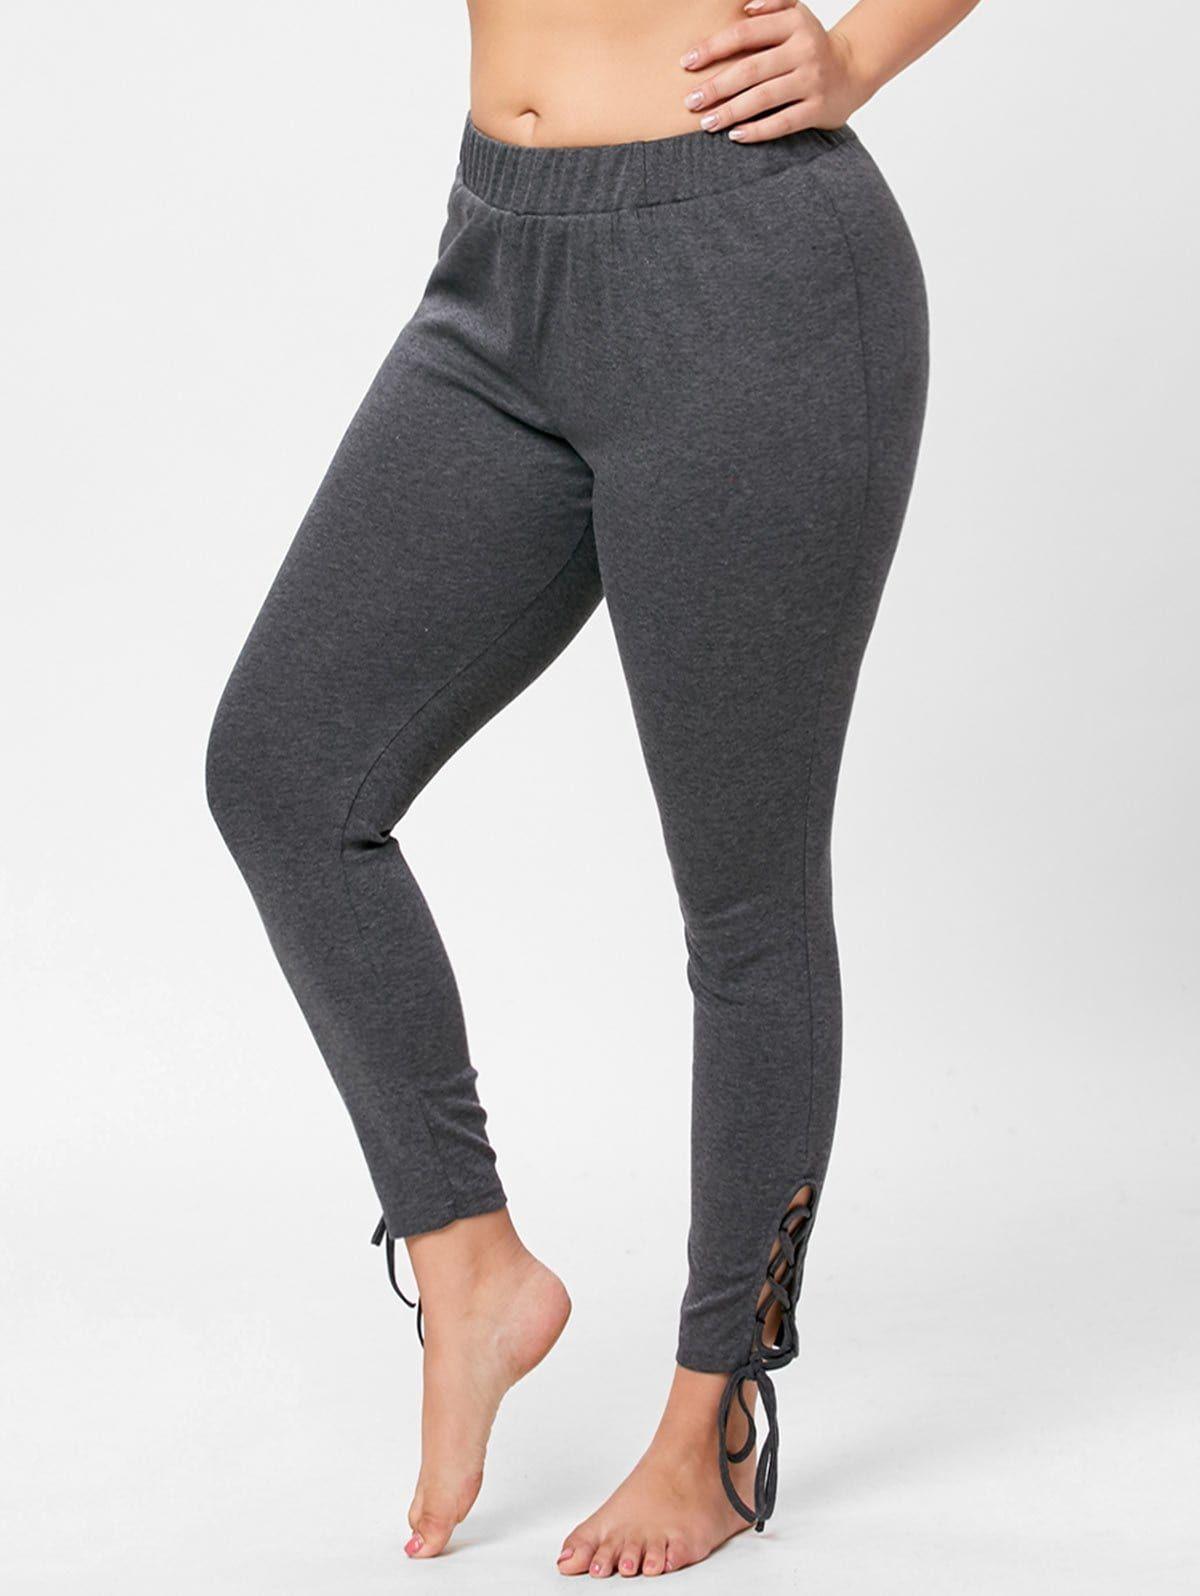 Plus Size Elastic Waist Lace Up Pants - GRAY 4XL | tina | Pants ...